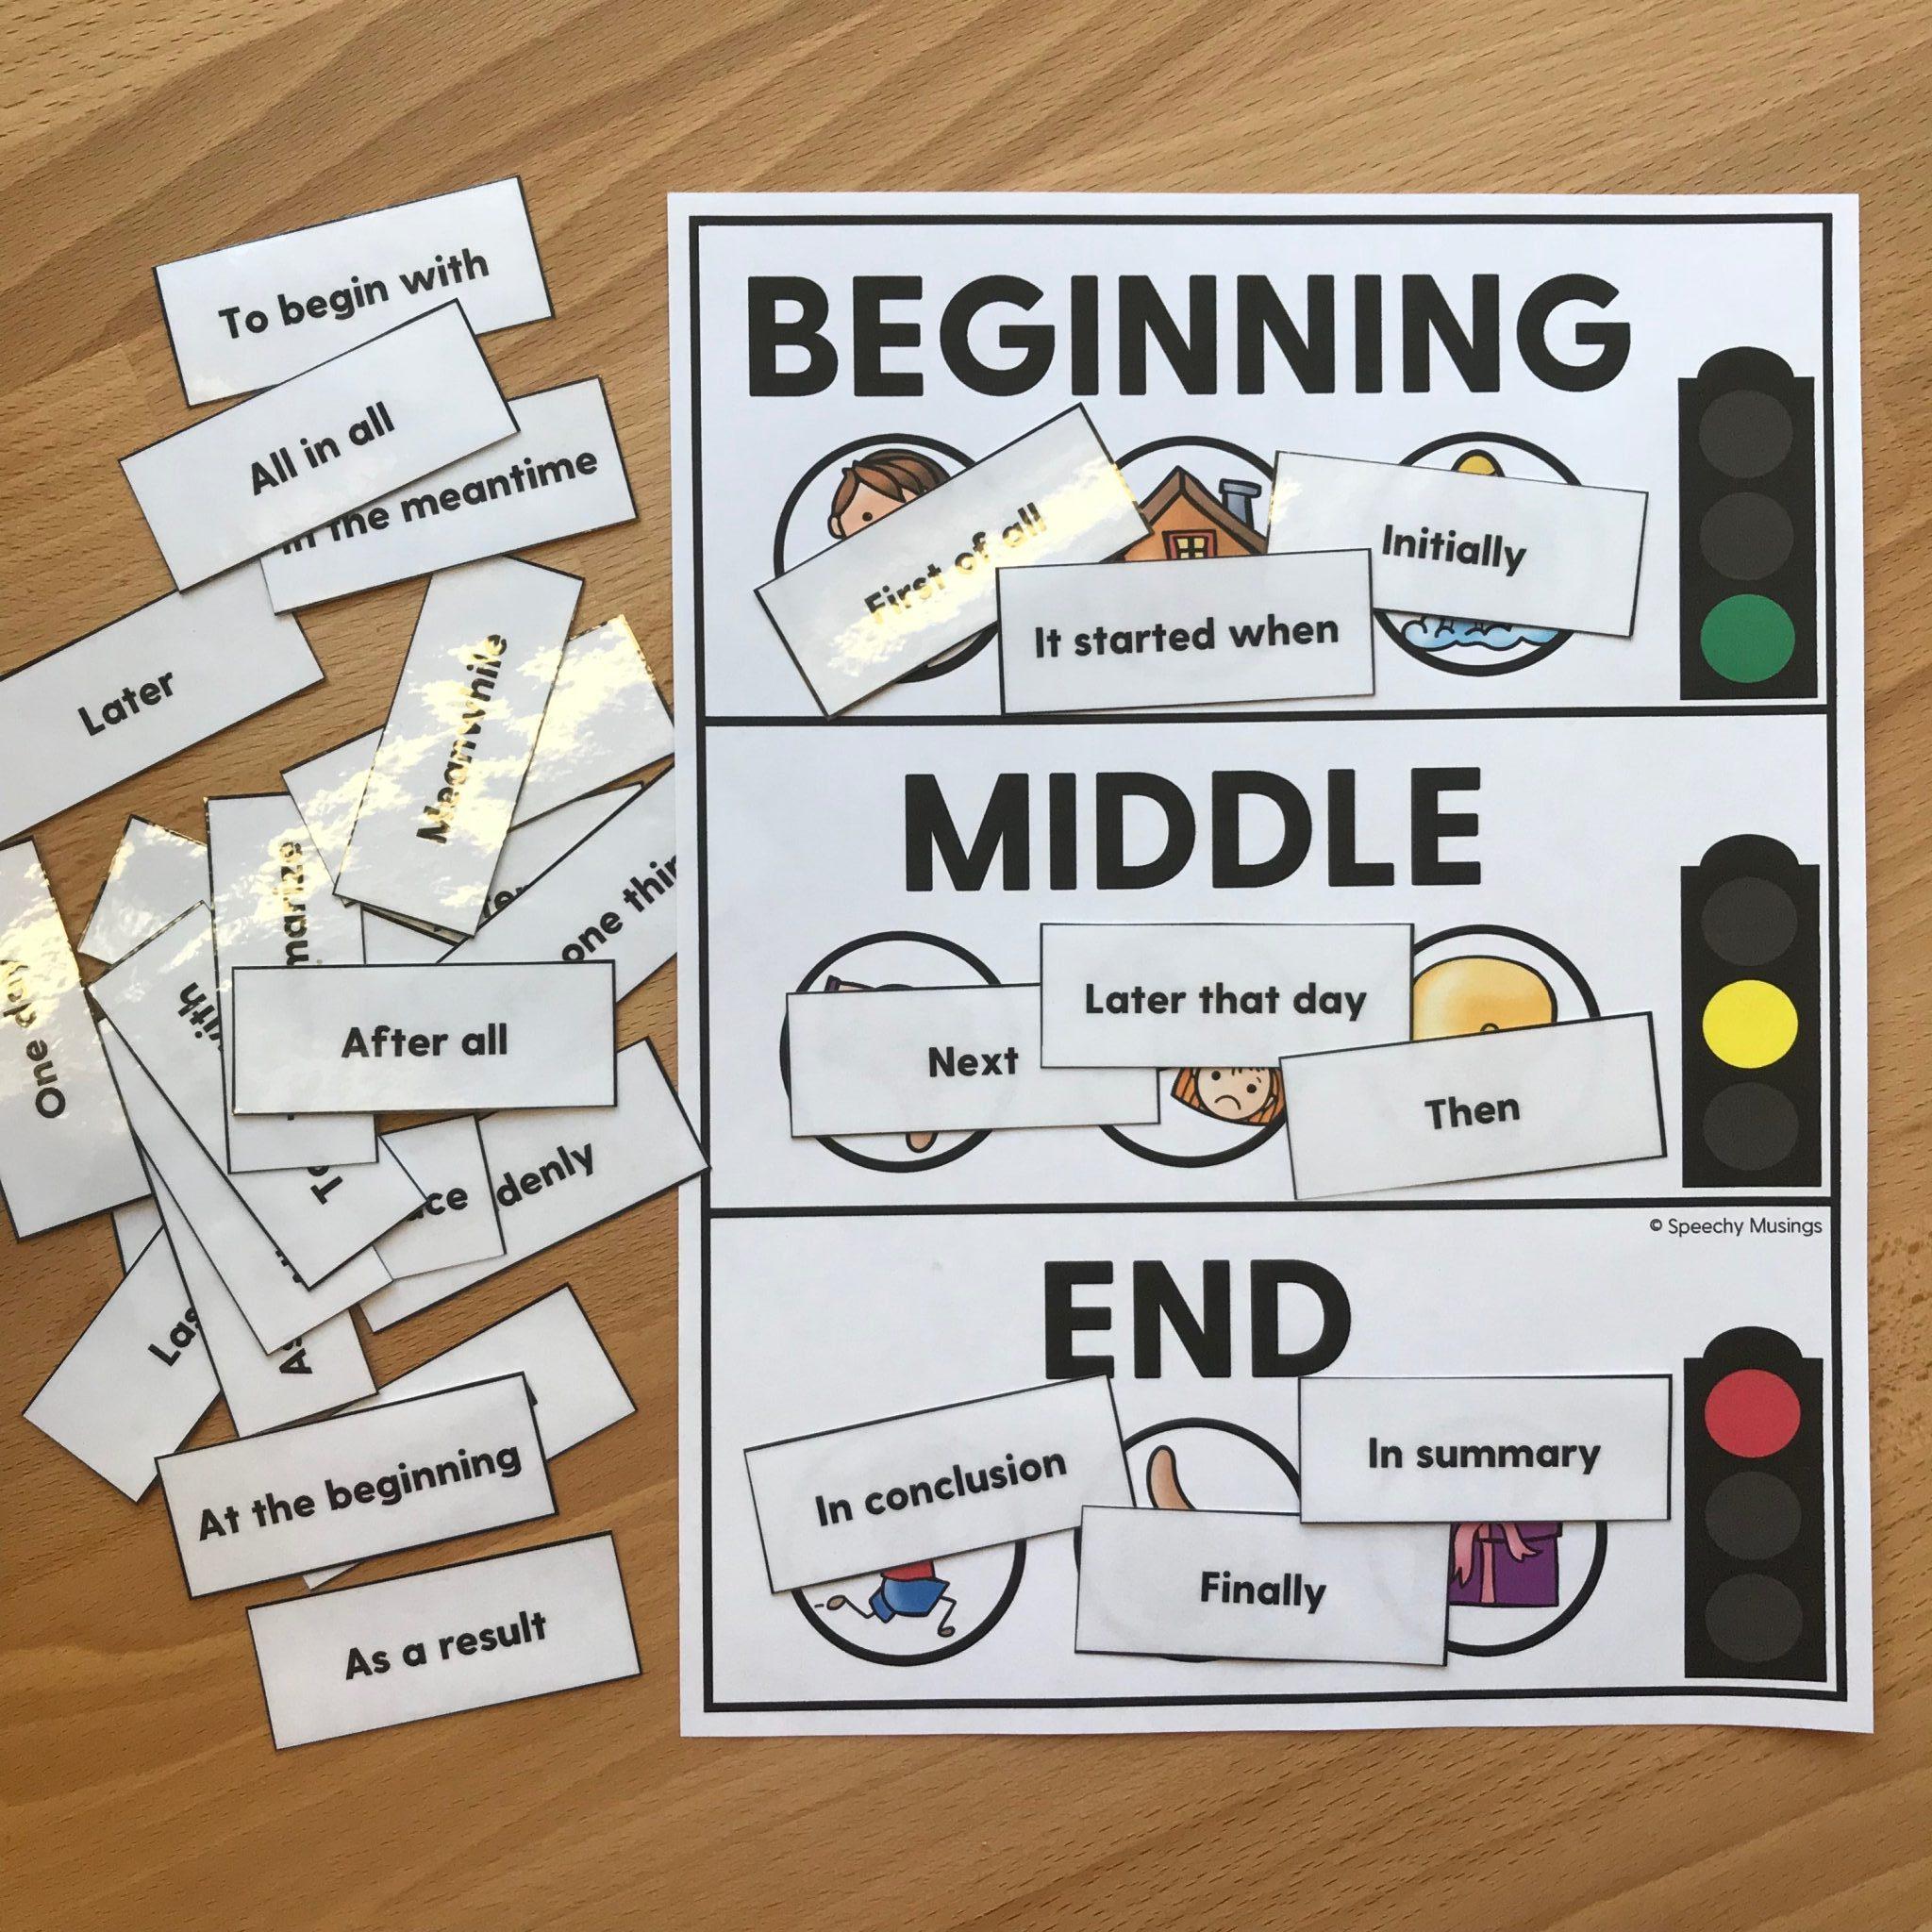 Teaching Story Grammar Parts in Narratives | Speechy Musings